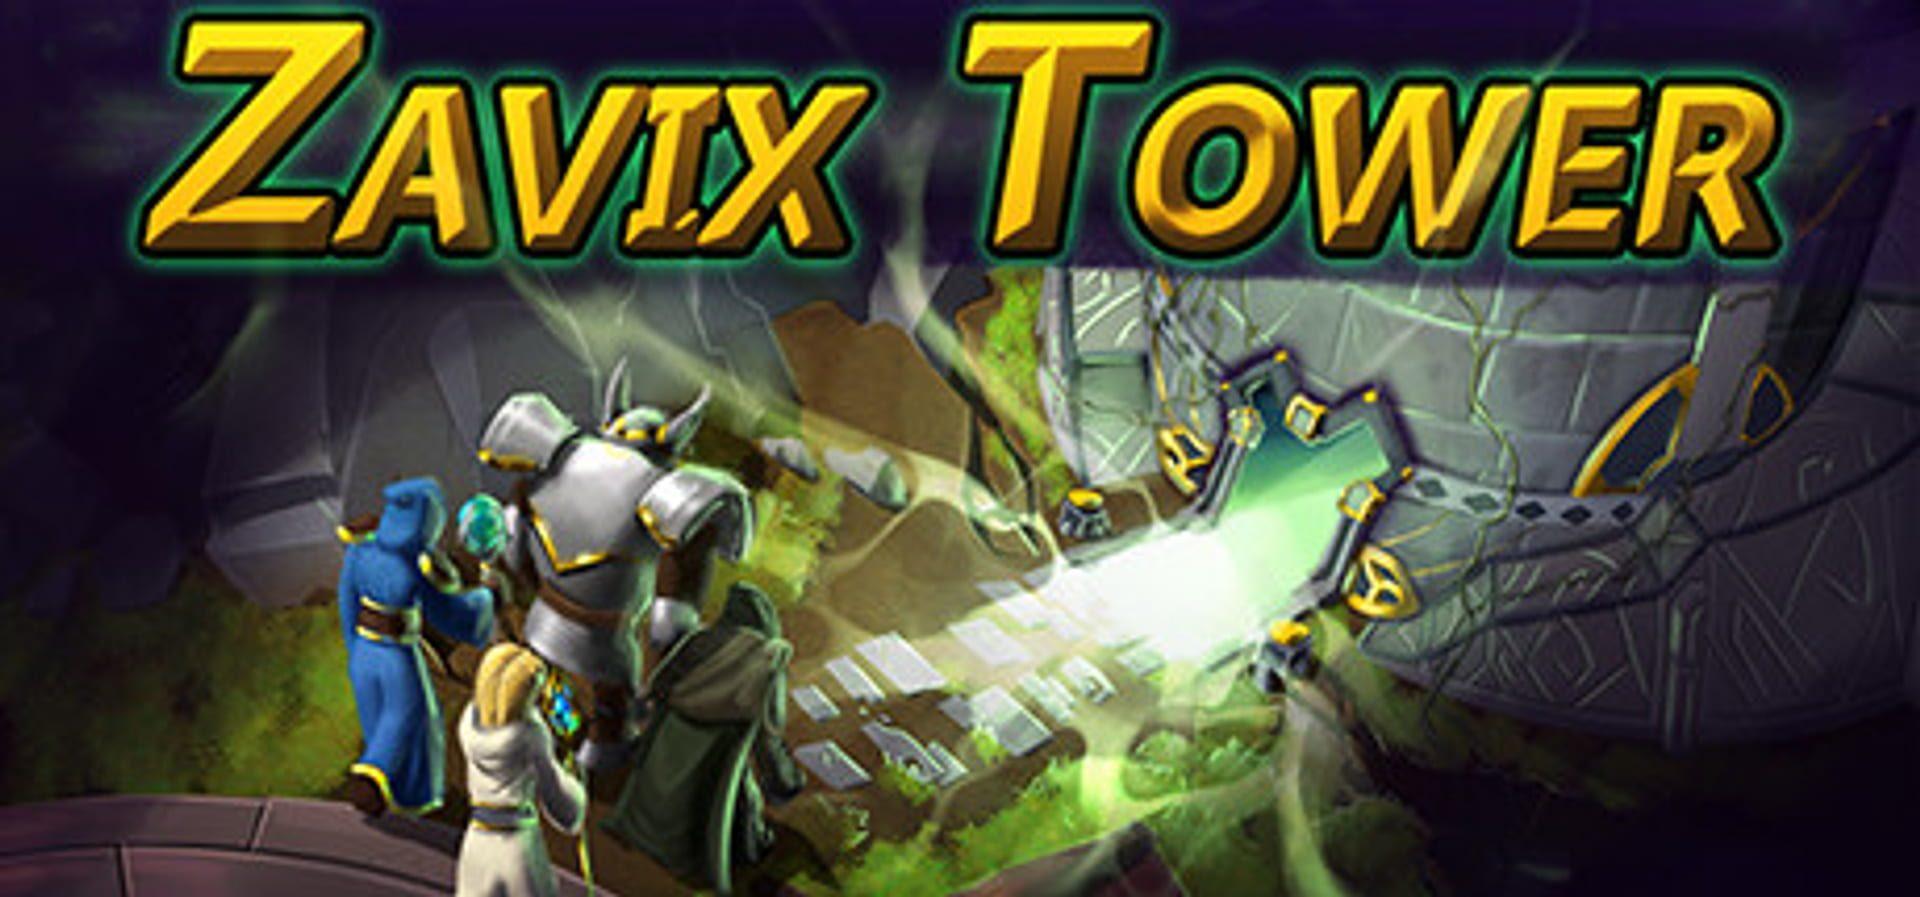 buy Zavix Tower cd key for all platform